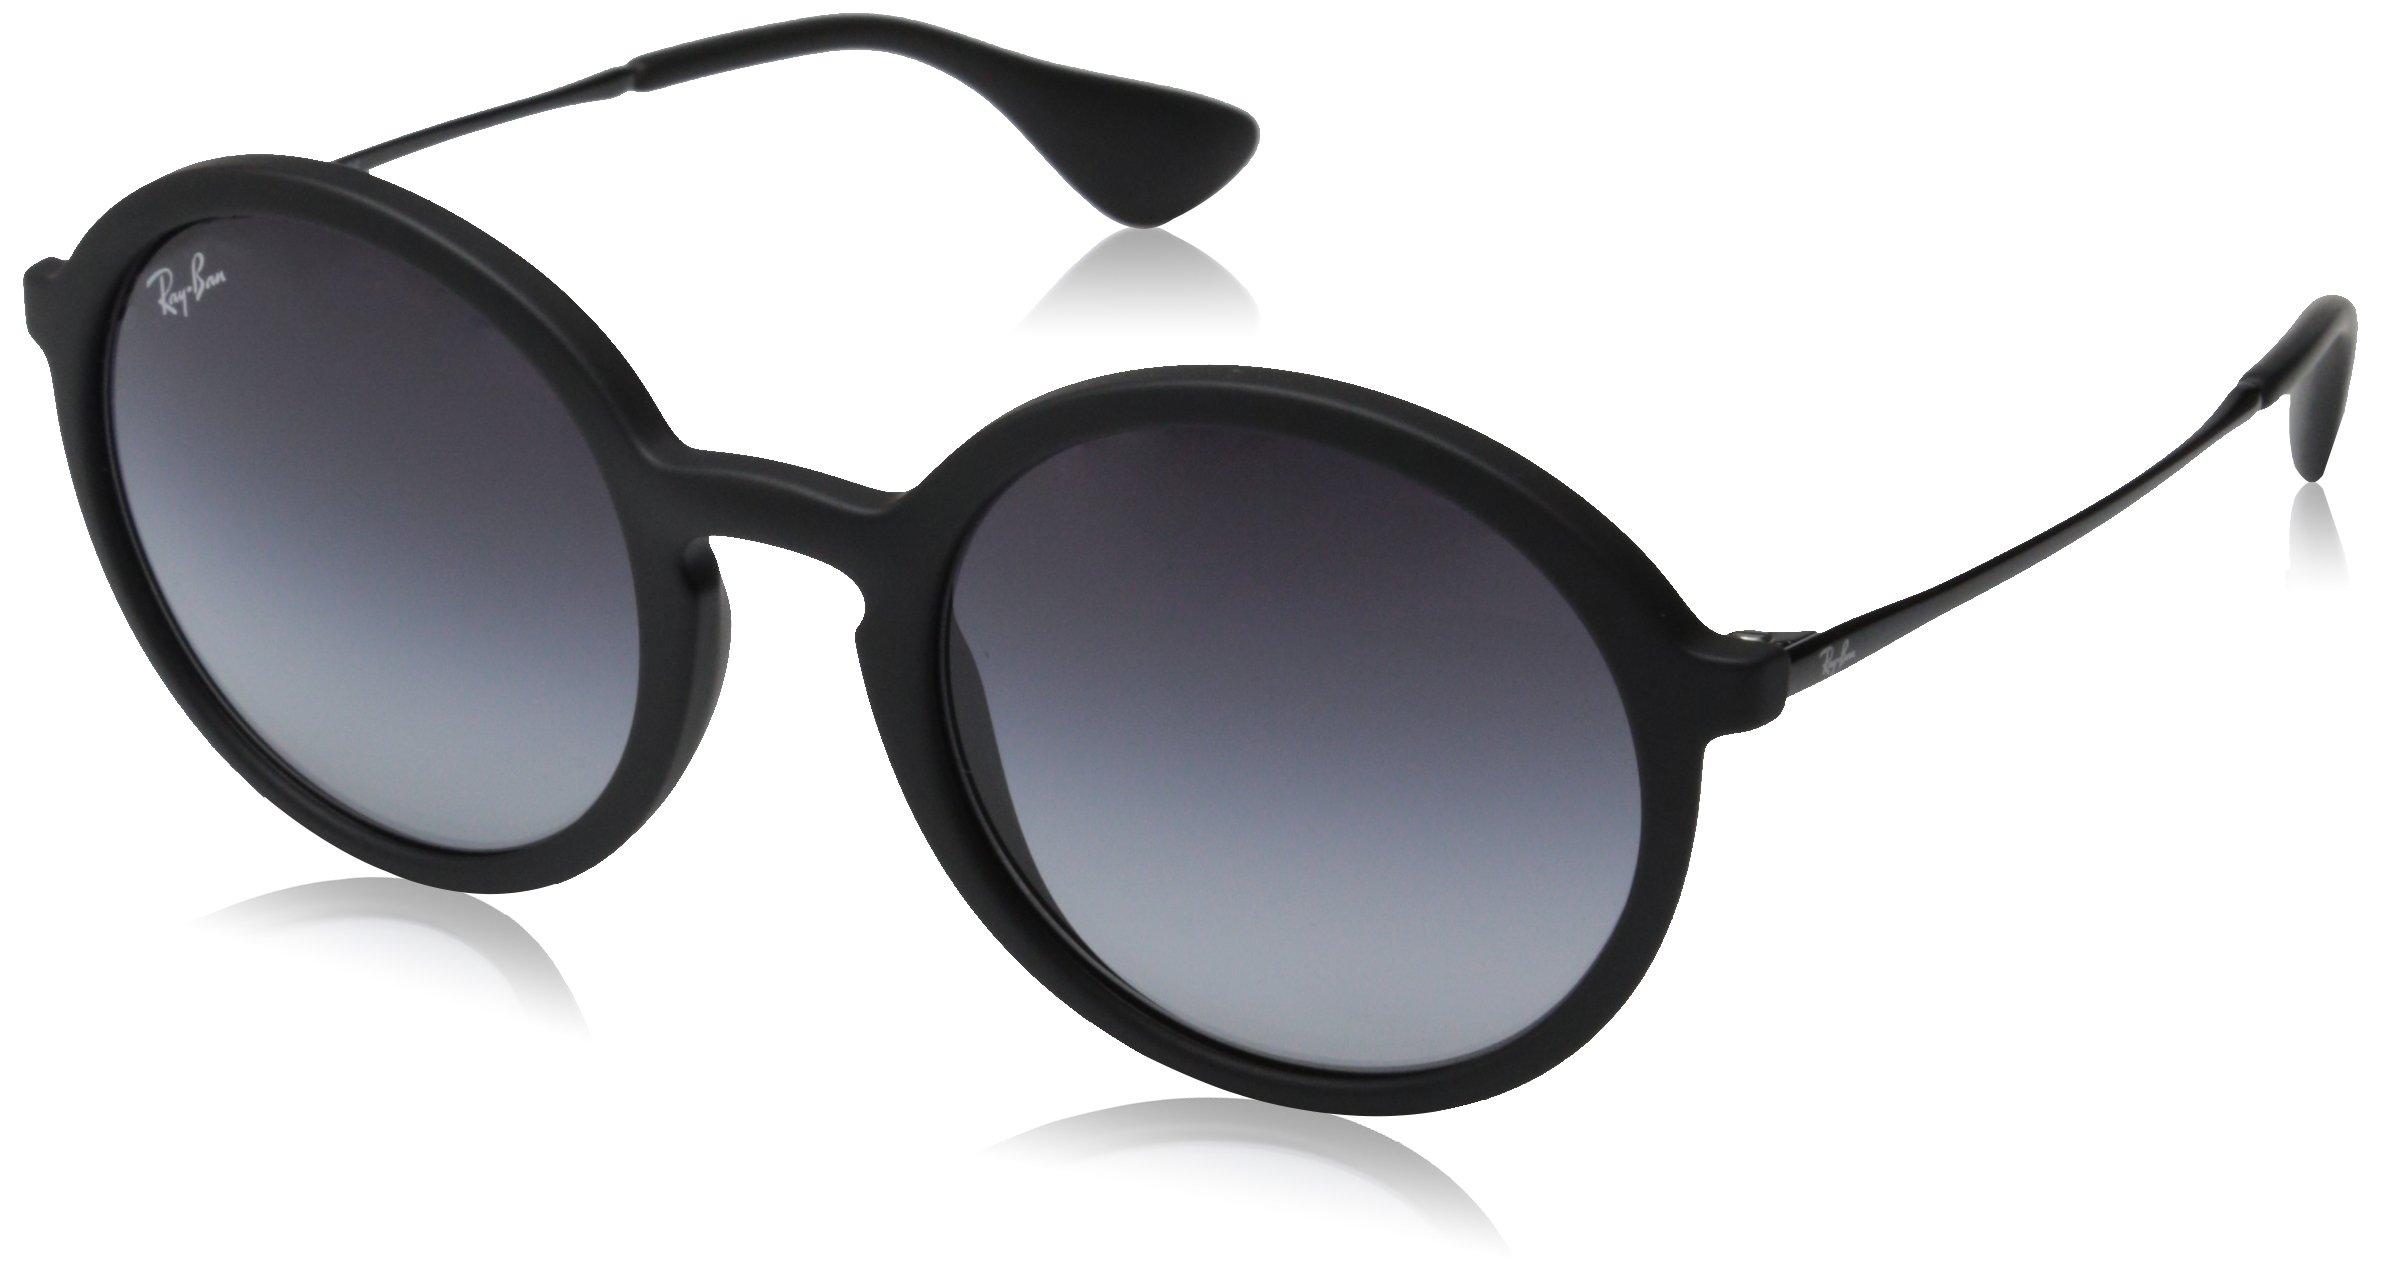 ray ban sunglasses repair mp66  ray ban sunglasses repair